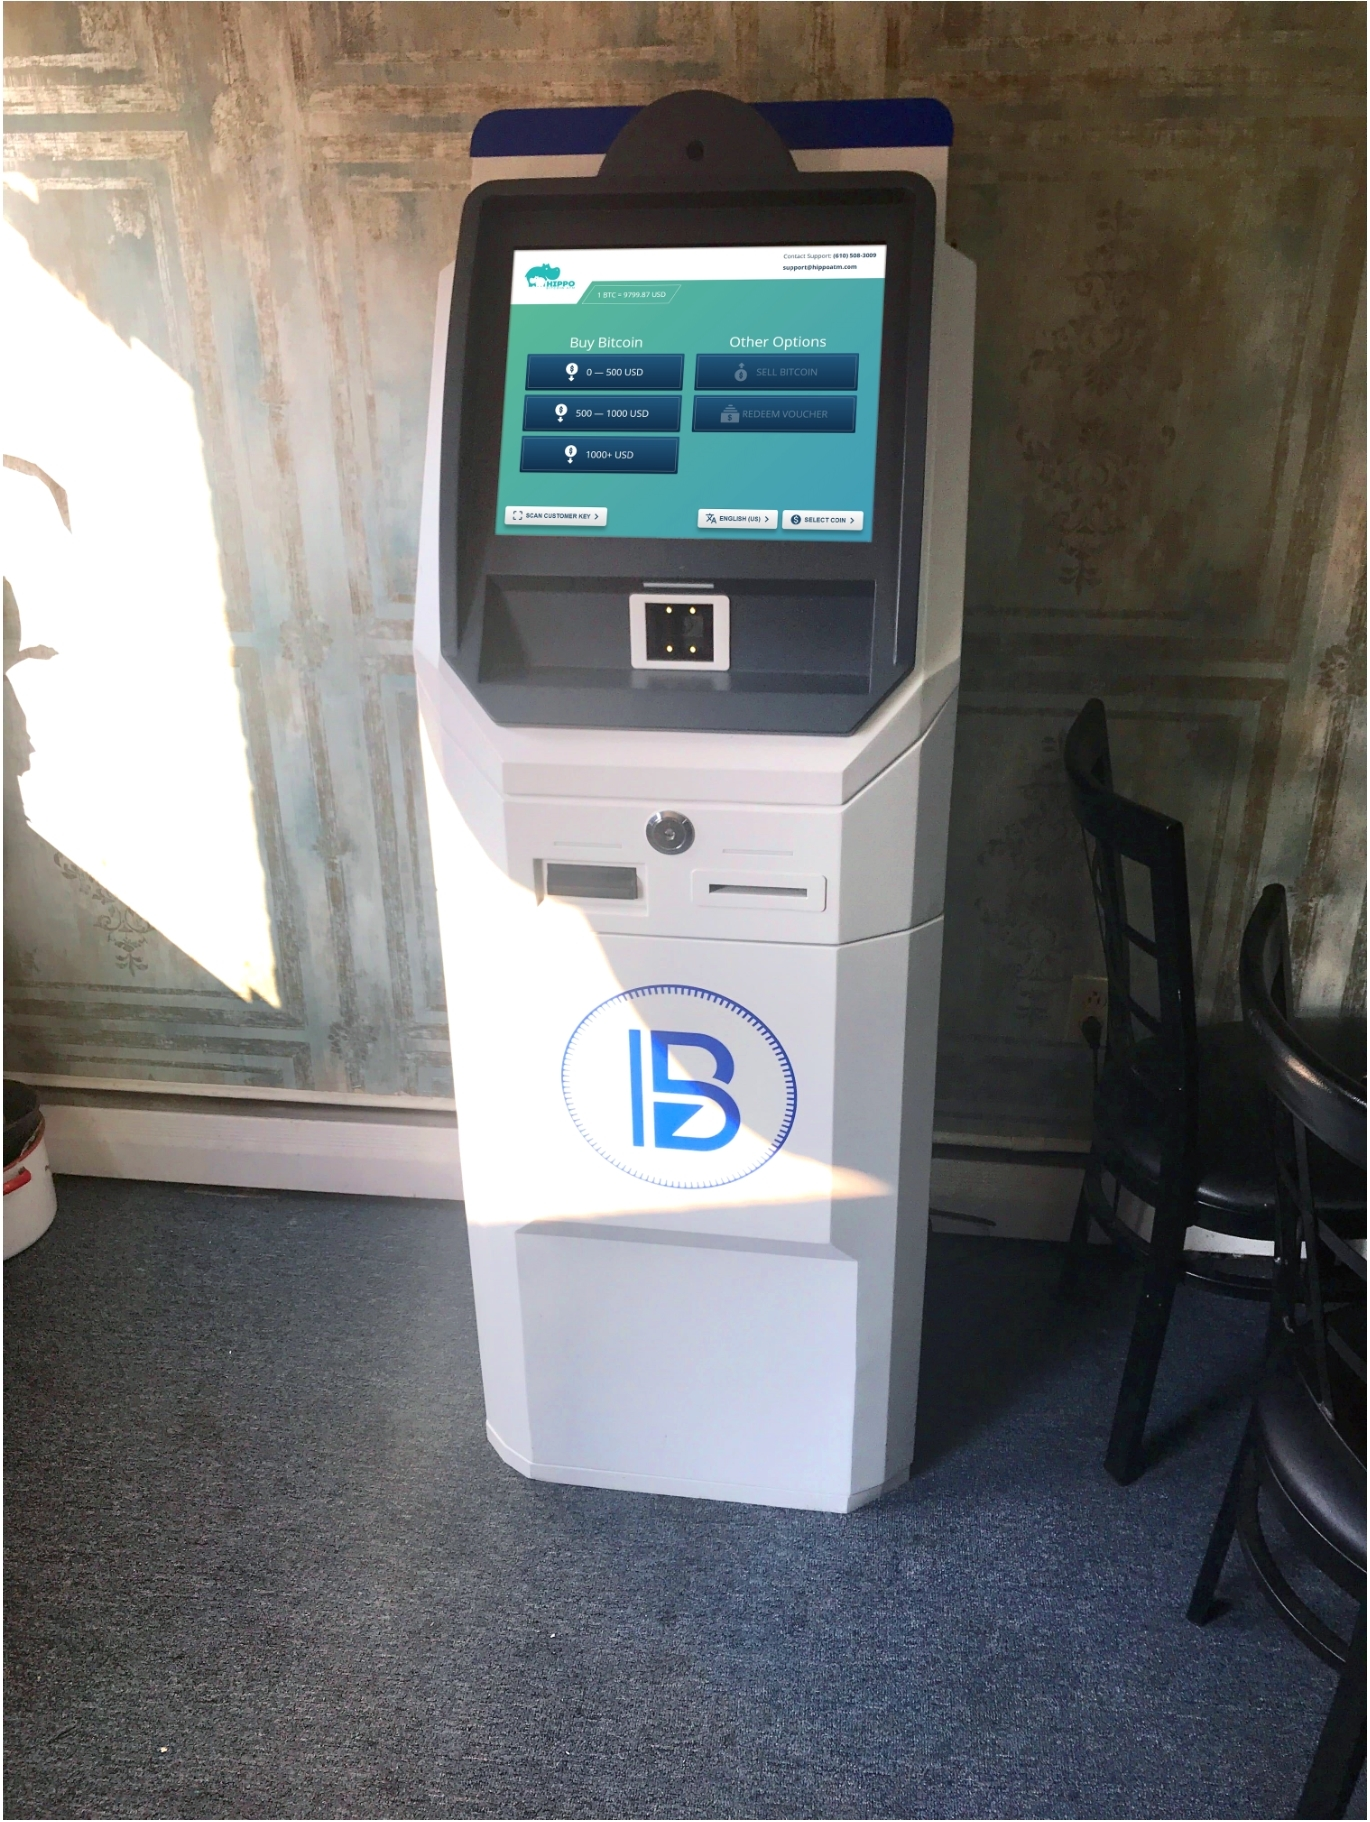 Bitcoin ATM Herrshey buy bitcon Satoshi Kiosks